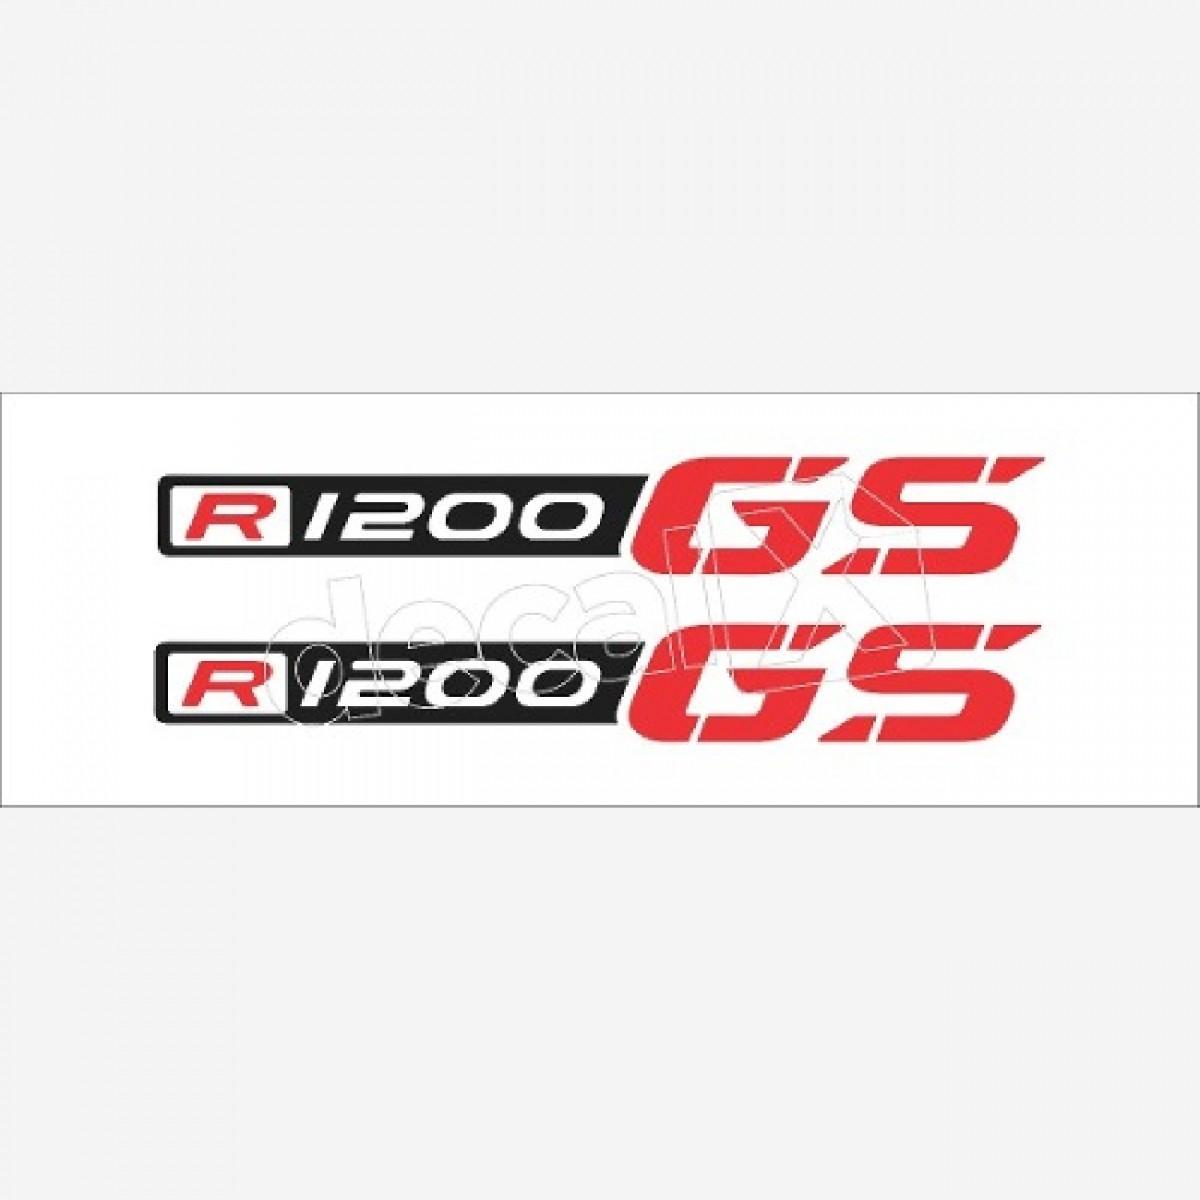 Emblema Adesivo Bmw R1200gs Gs Branca Decalx